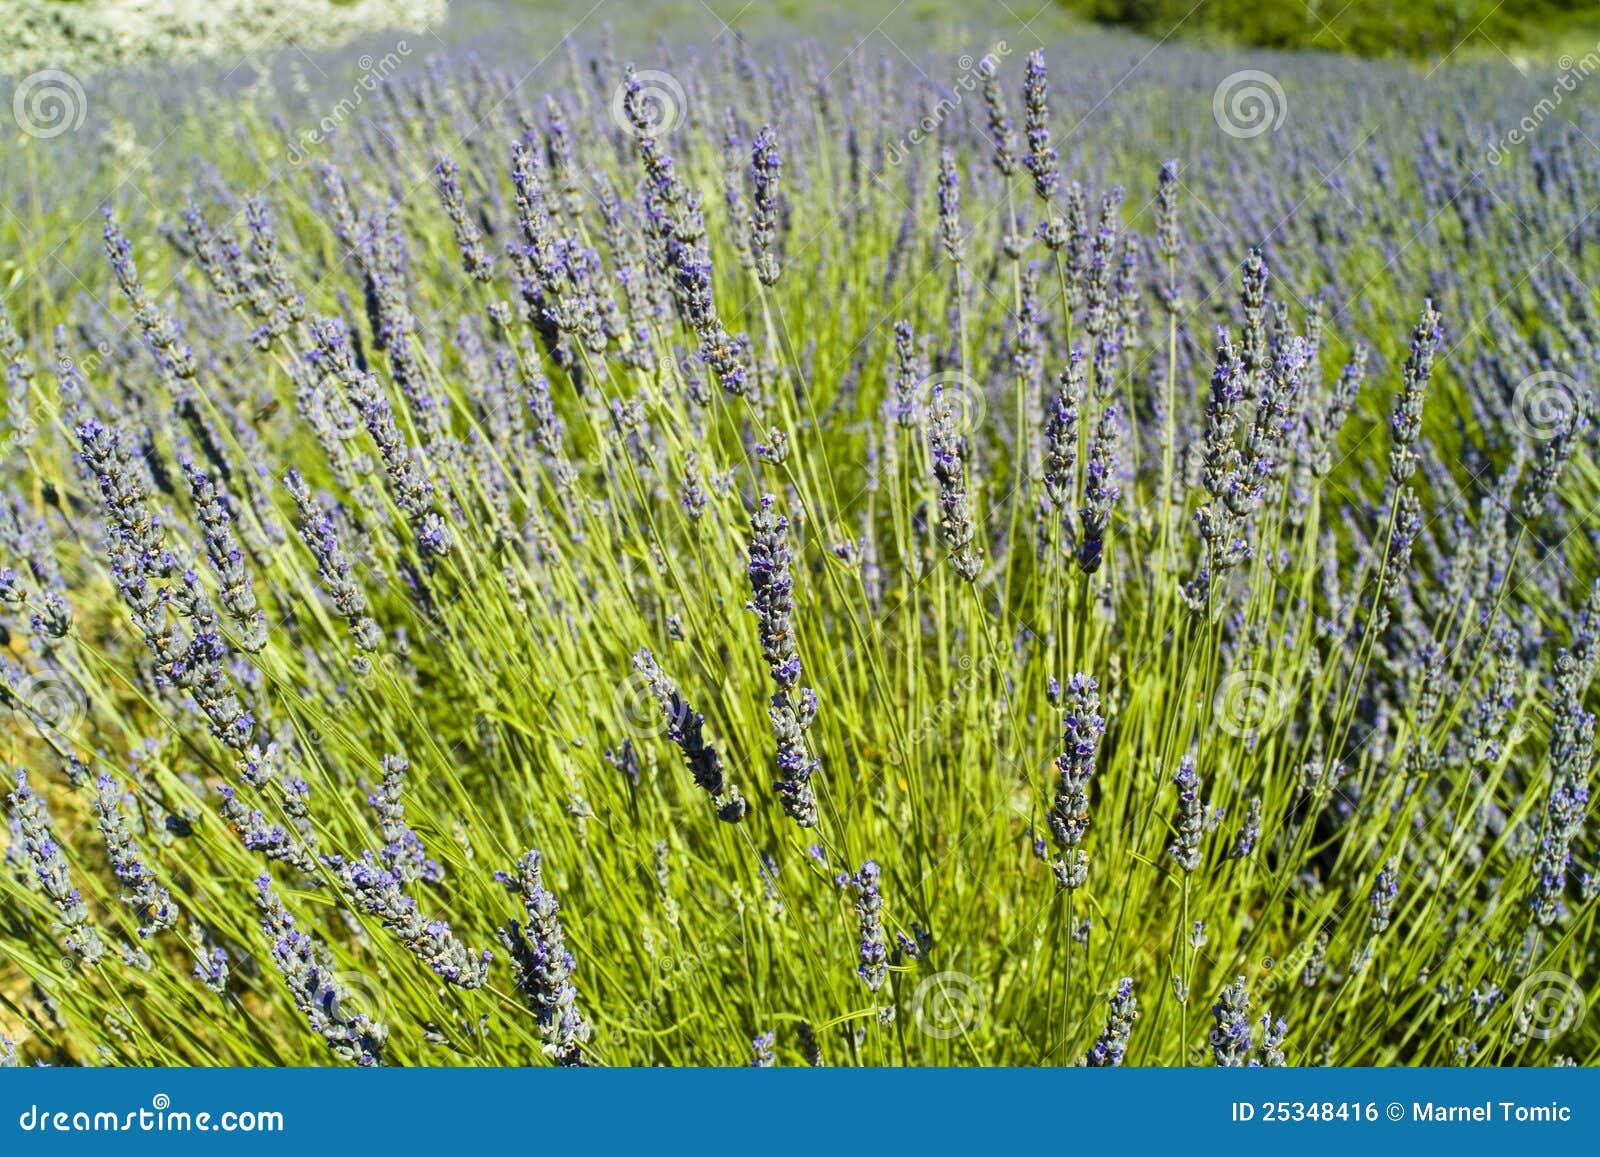 The lavender (Lavandula) bush and field